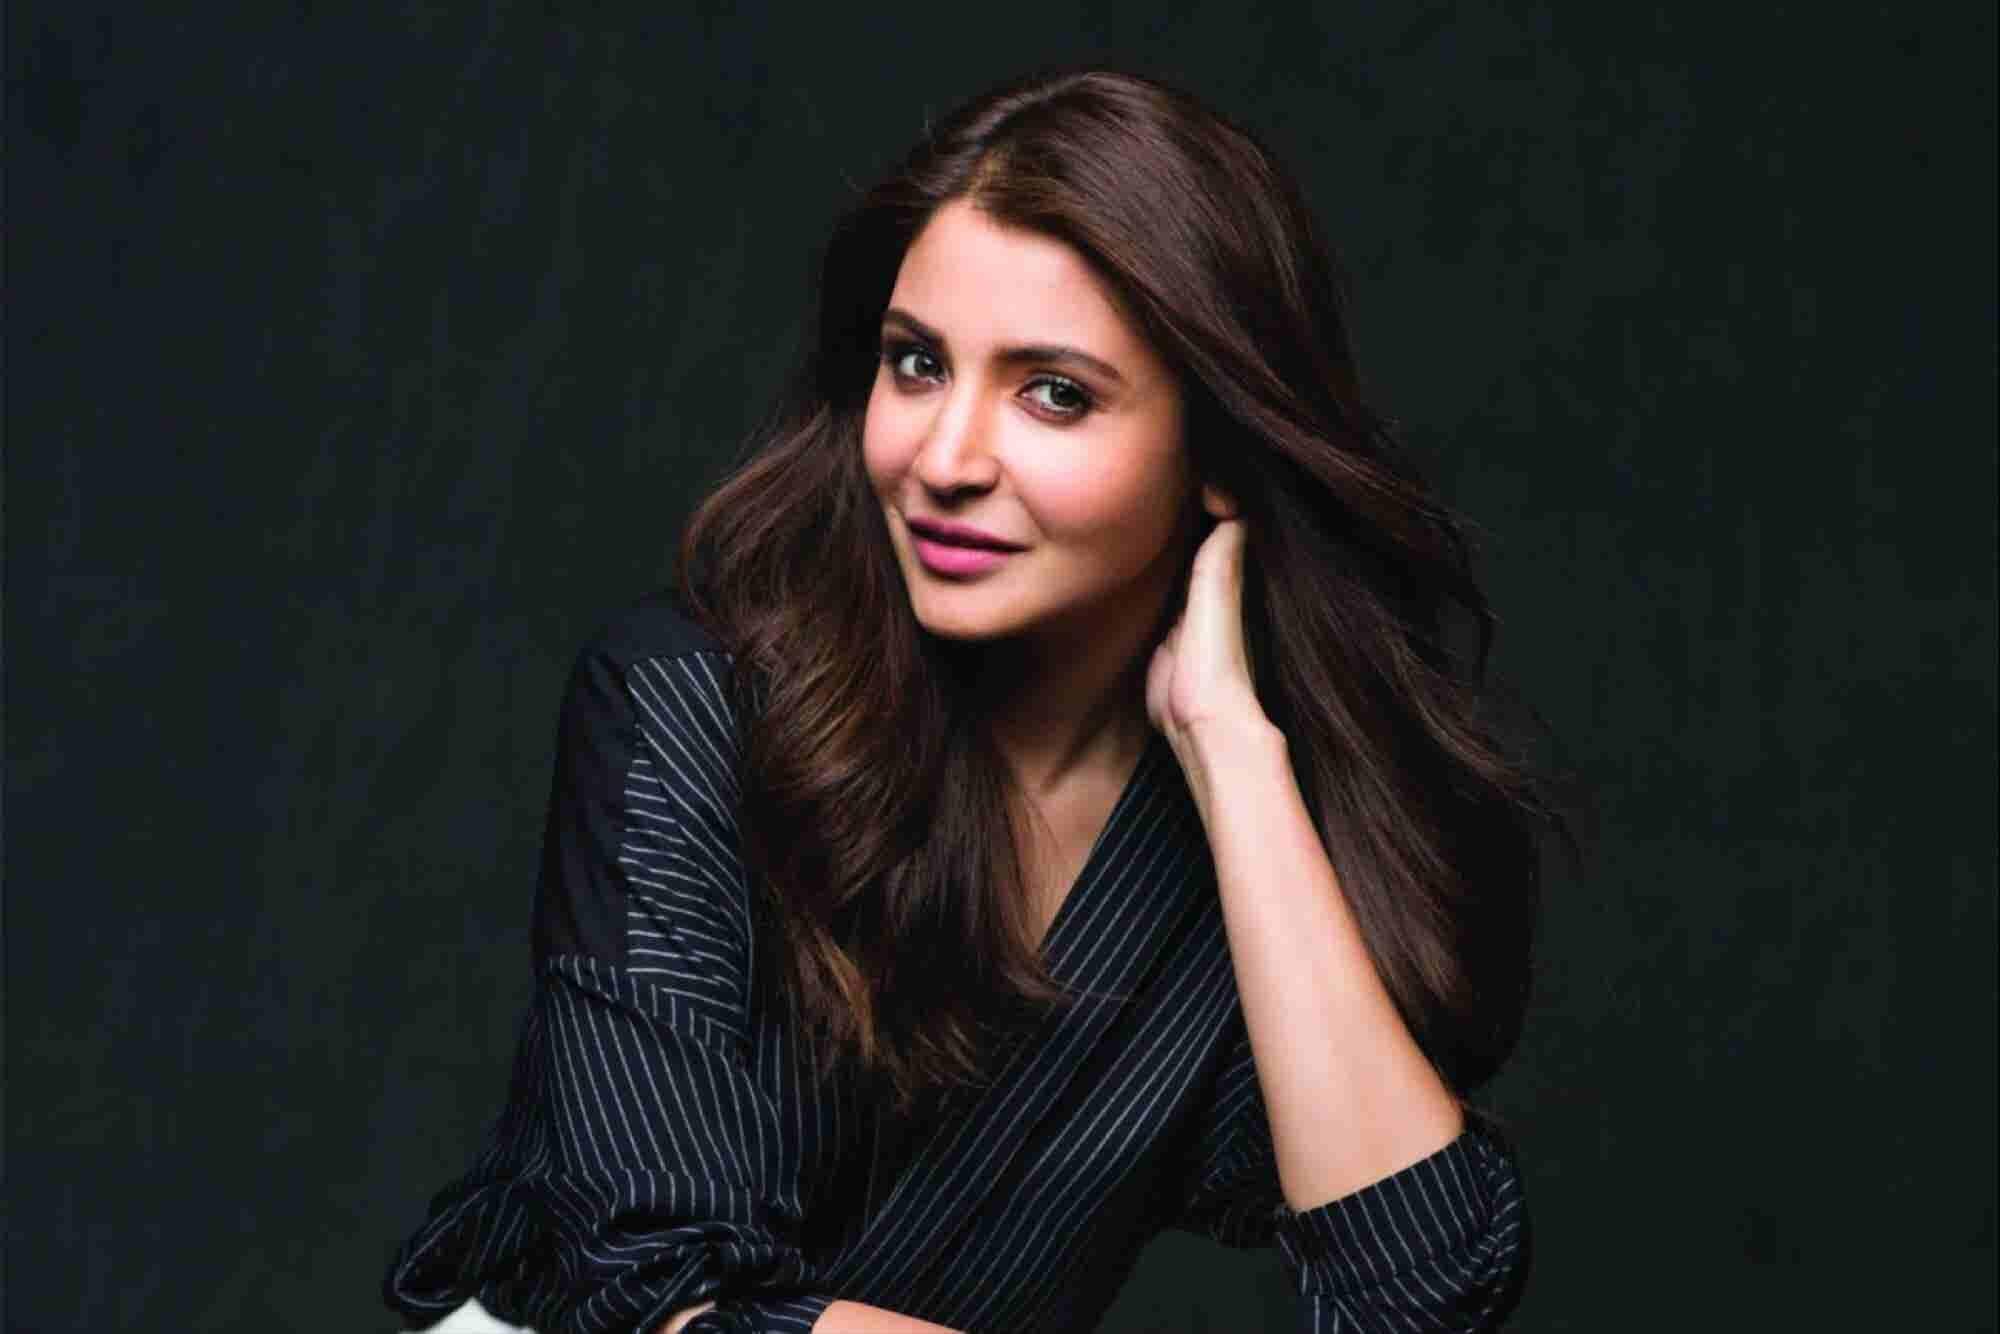 How Anushka Sharma is Making her Mark on-screen and Behind the Scenes